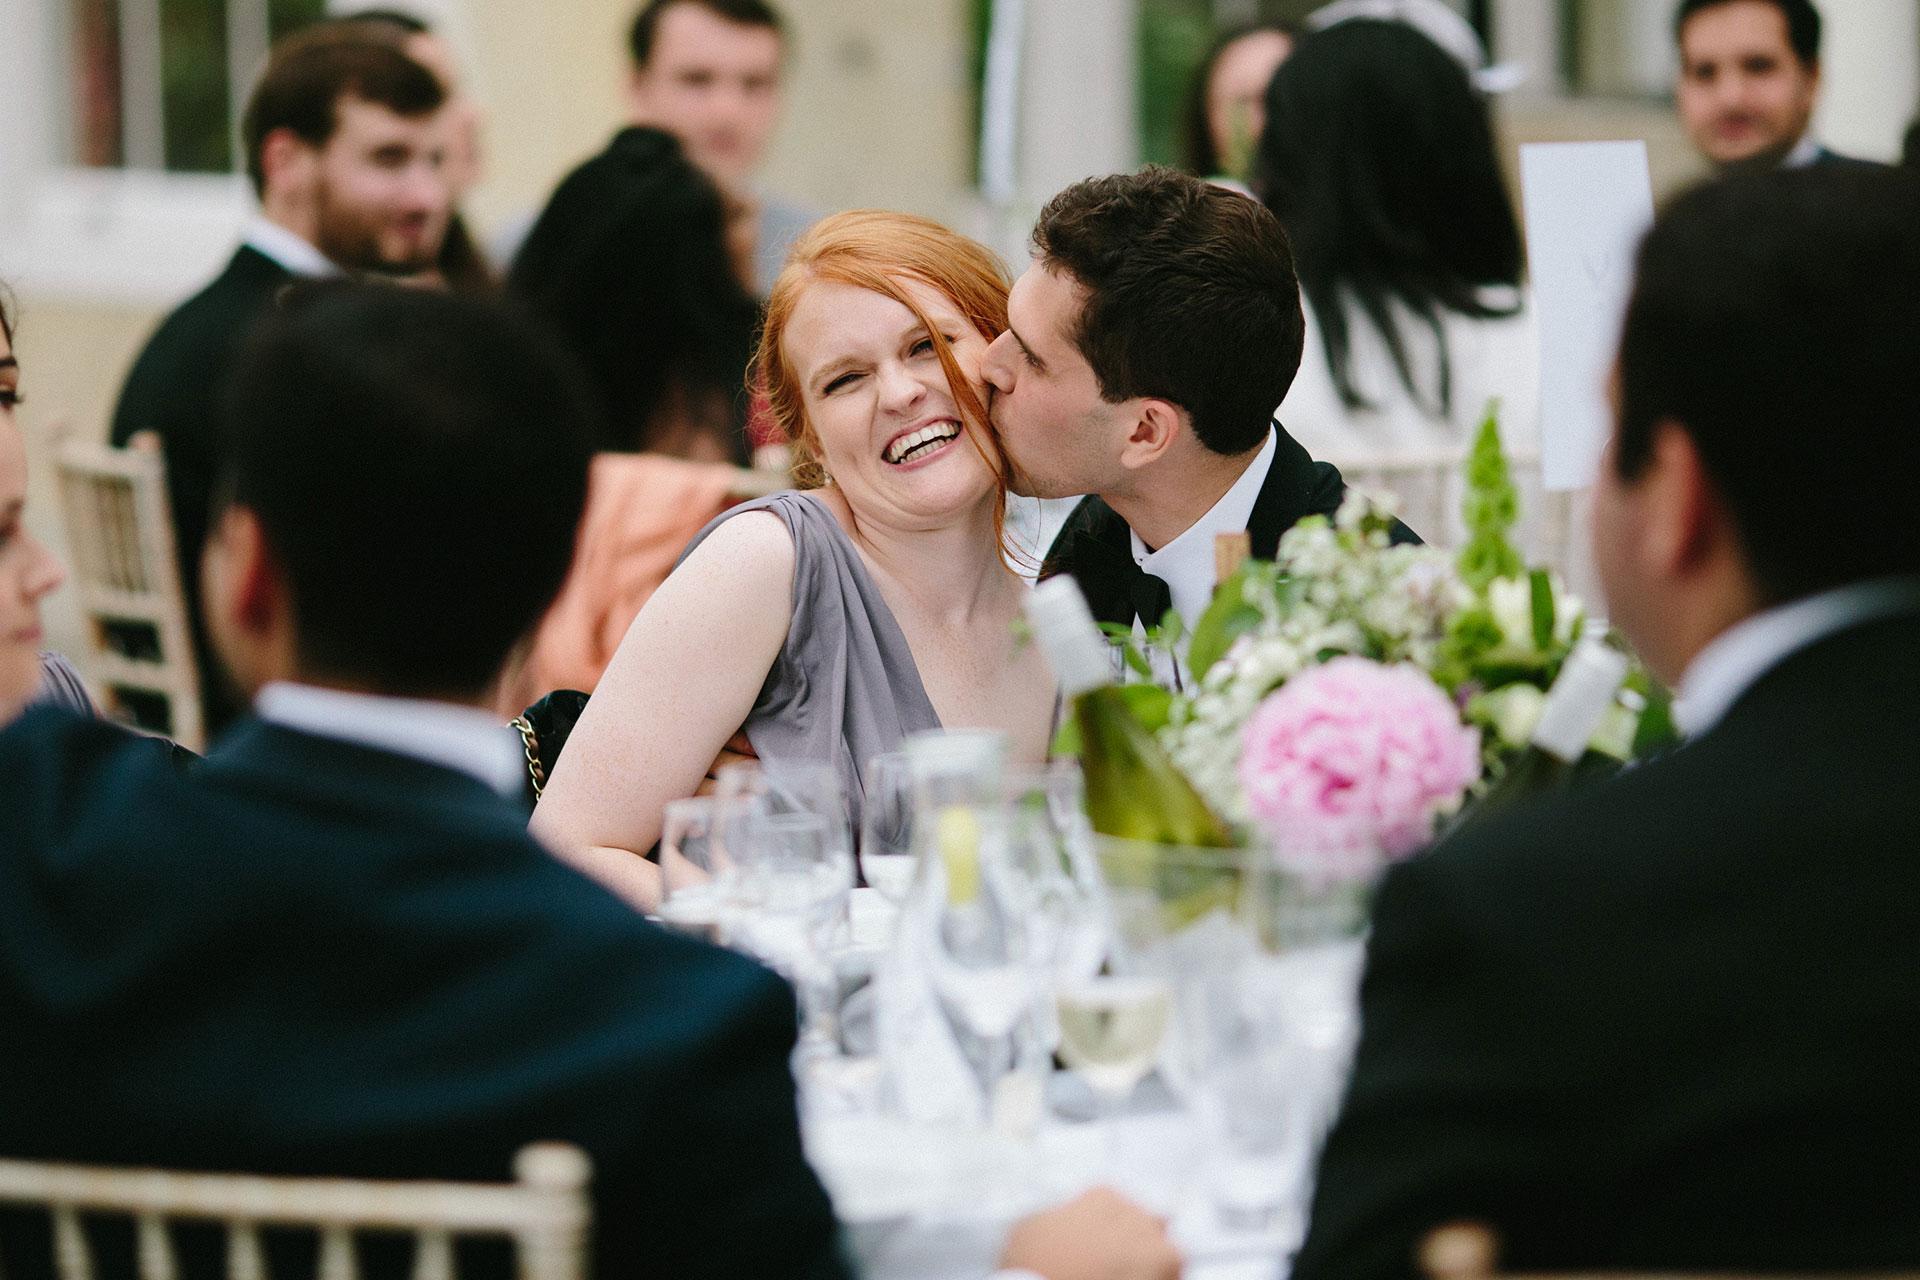 Syon-Park-Wedding-Photographer--_-Michael-Newington-Gray-616.jpg